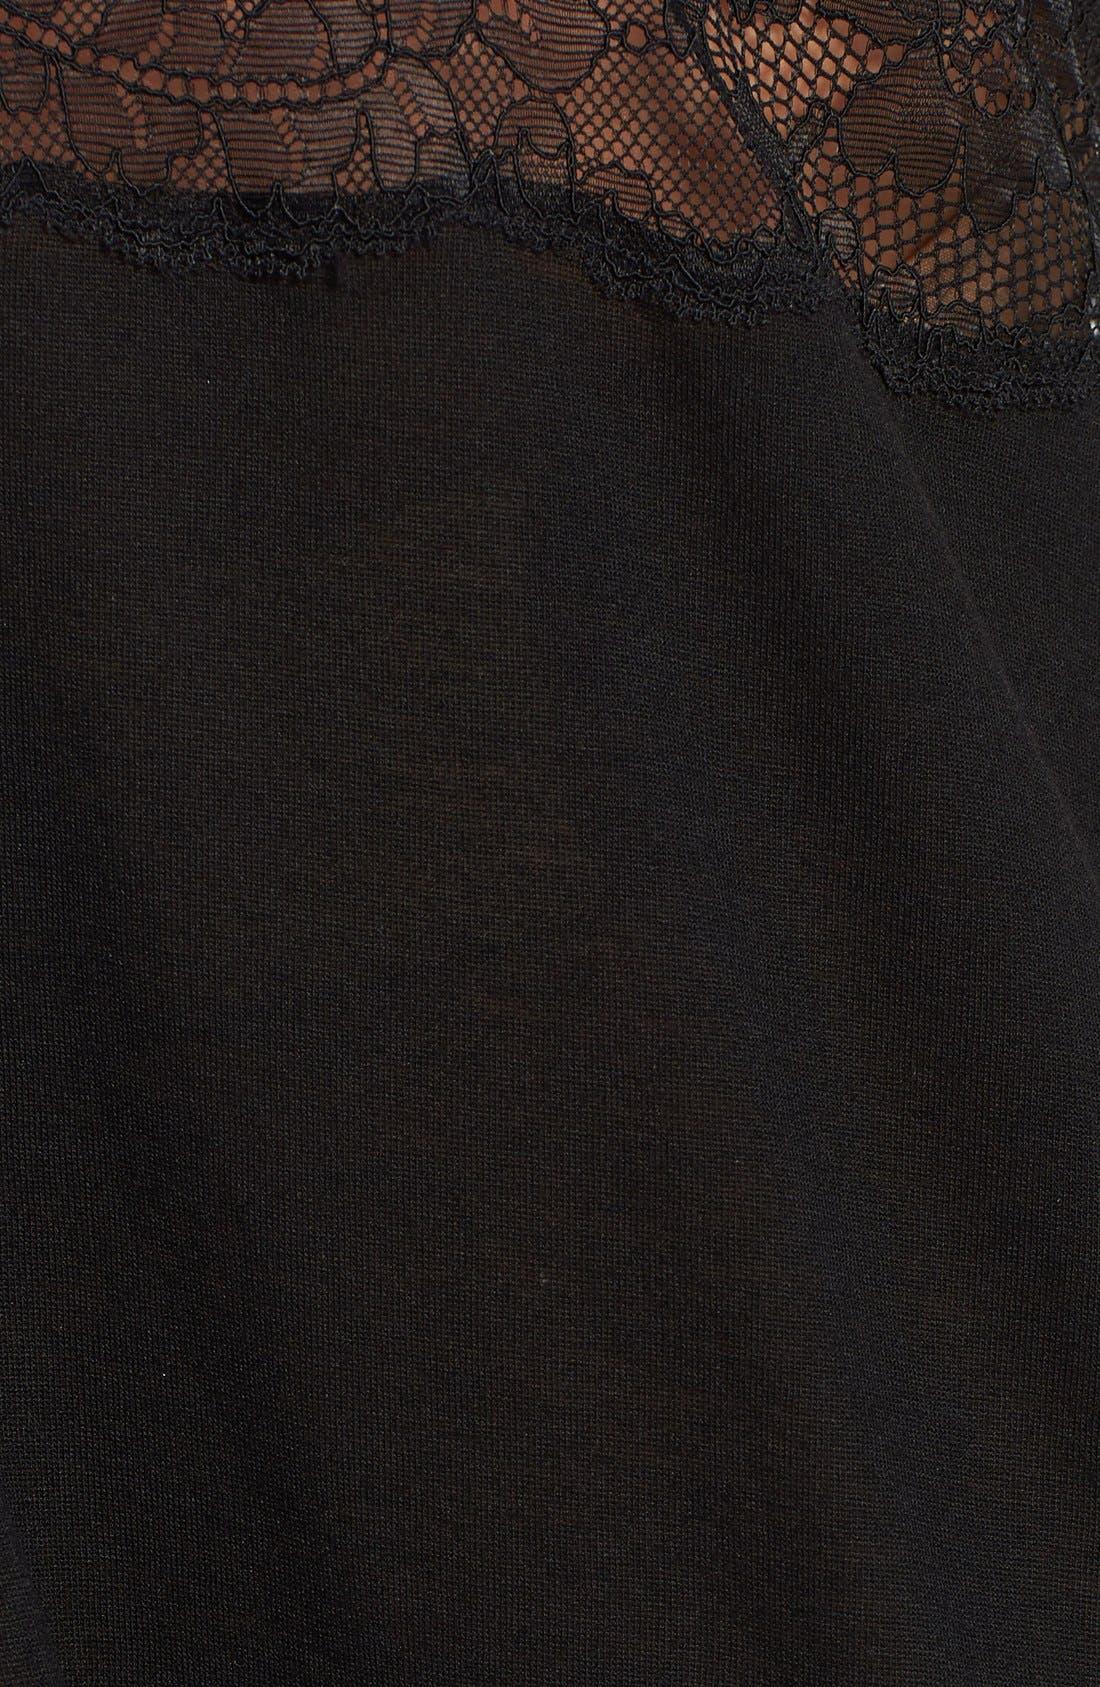 Alternate Image 3  - Oscar de la Renta 'Love of Lace' Chemise (Plus Size)